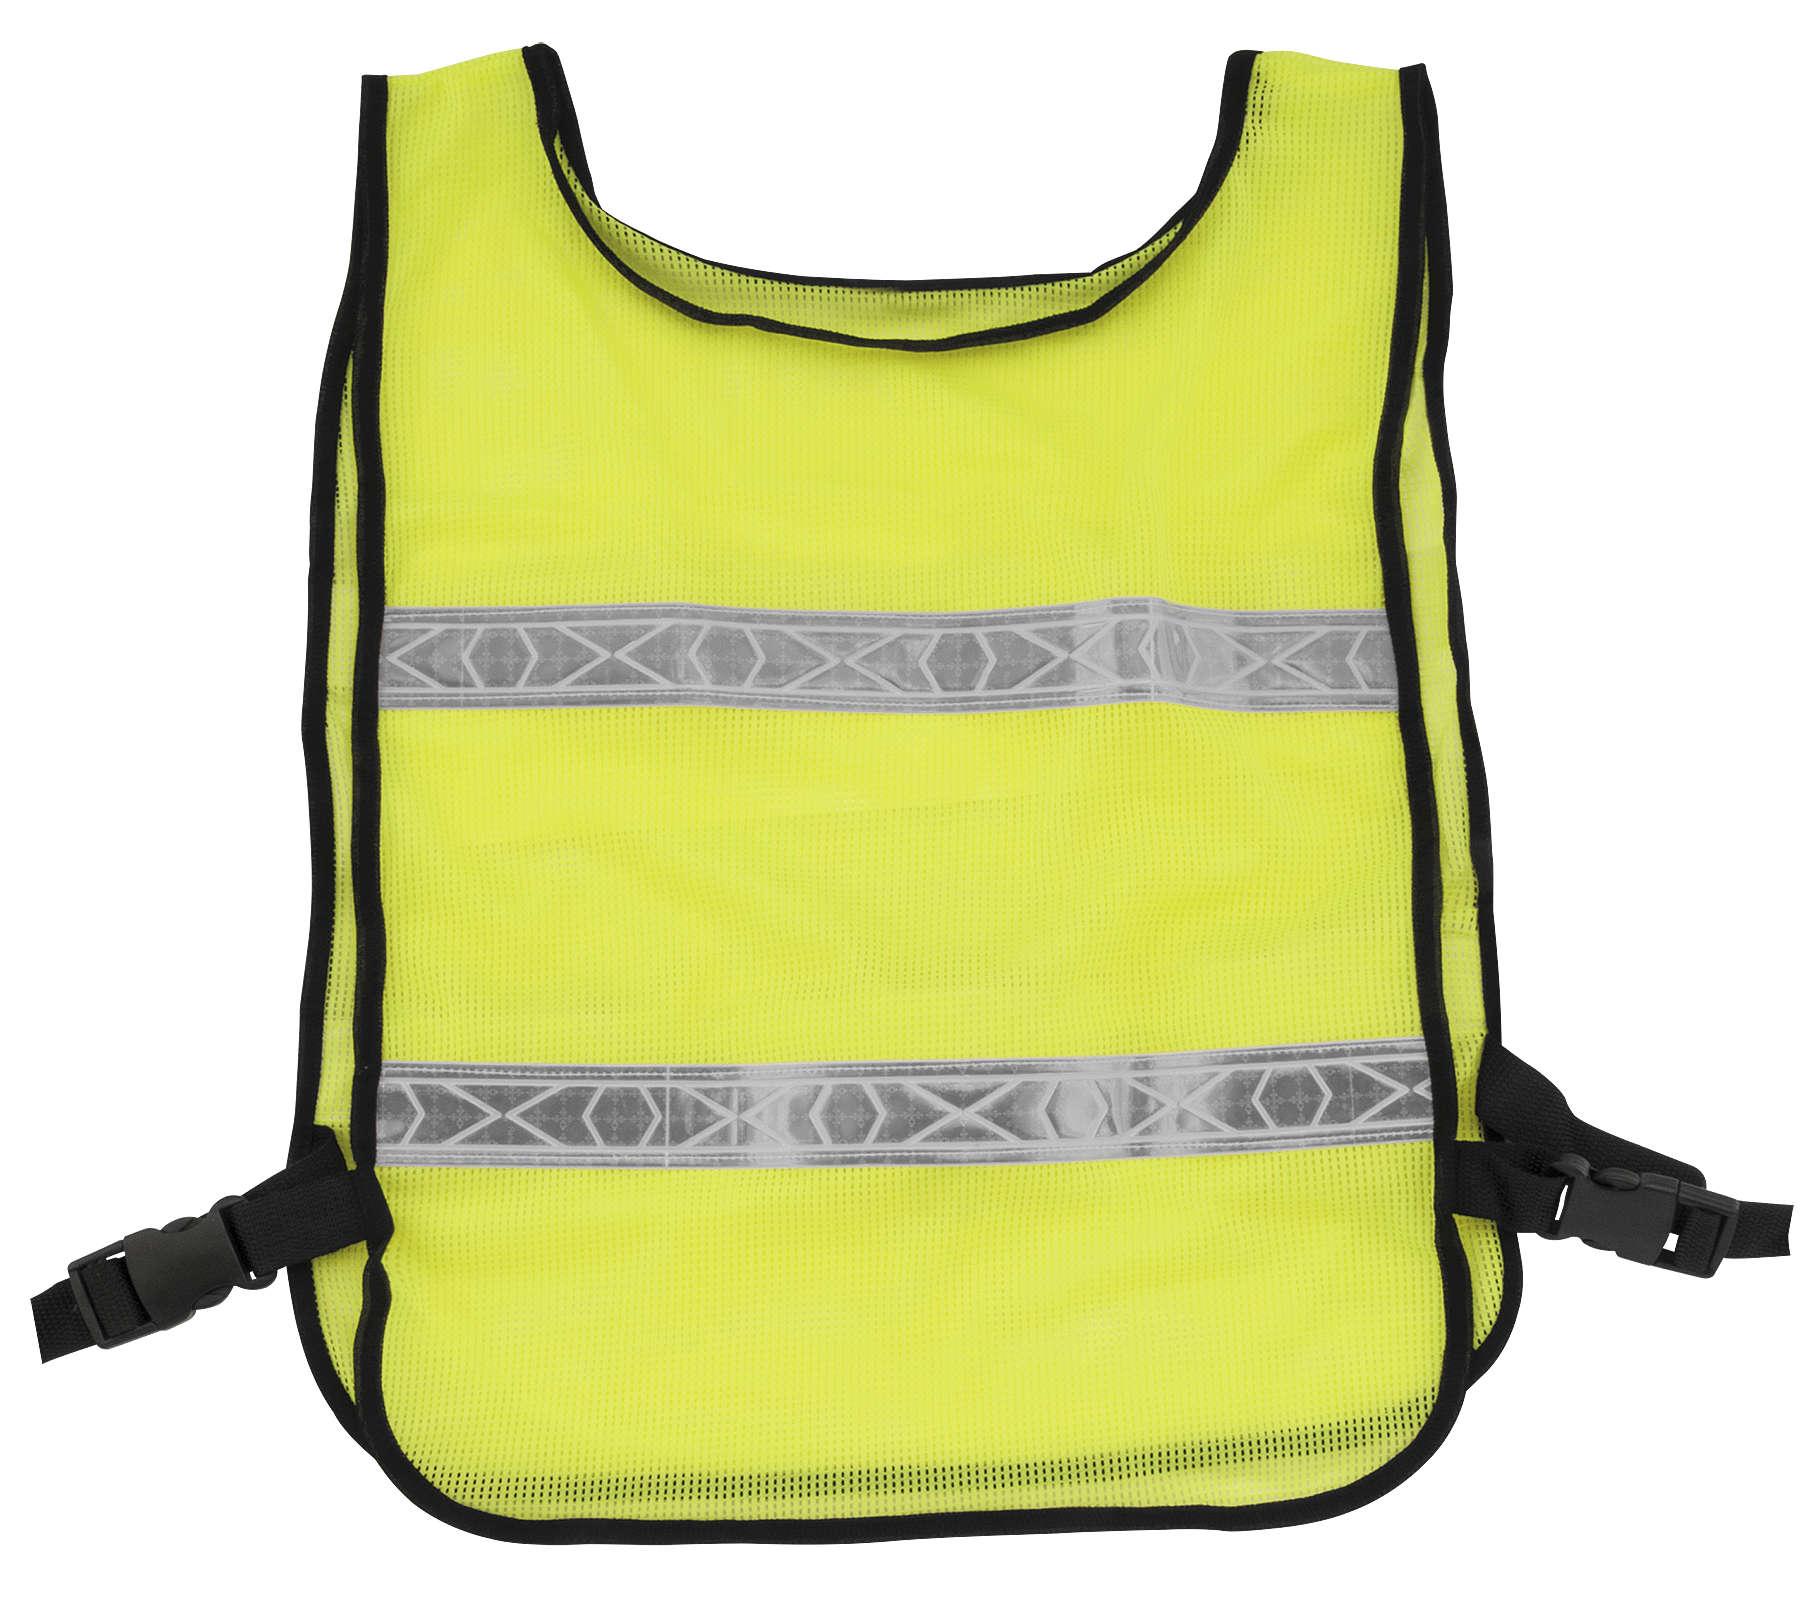 BikeMaster Reflective Safety Vest